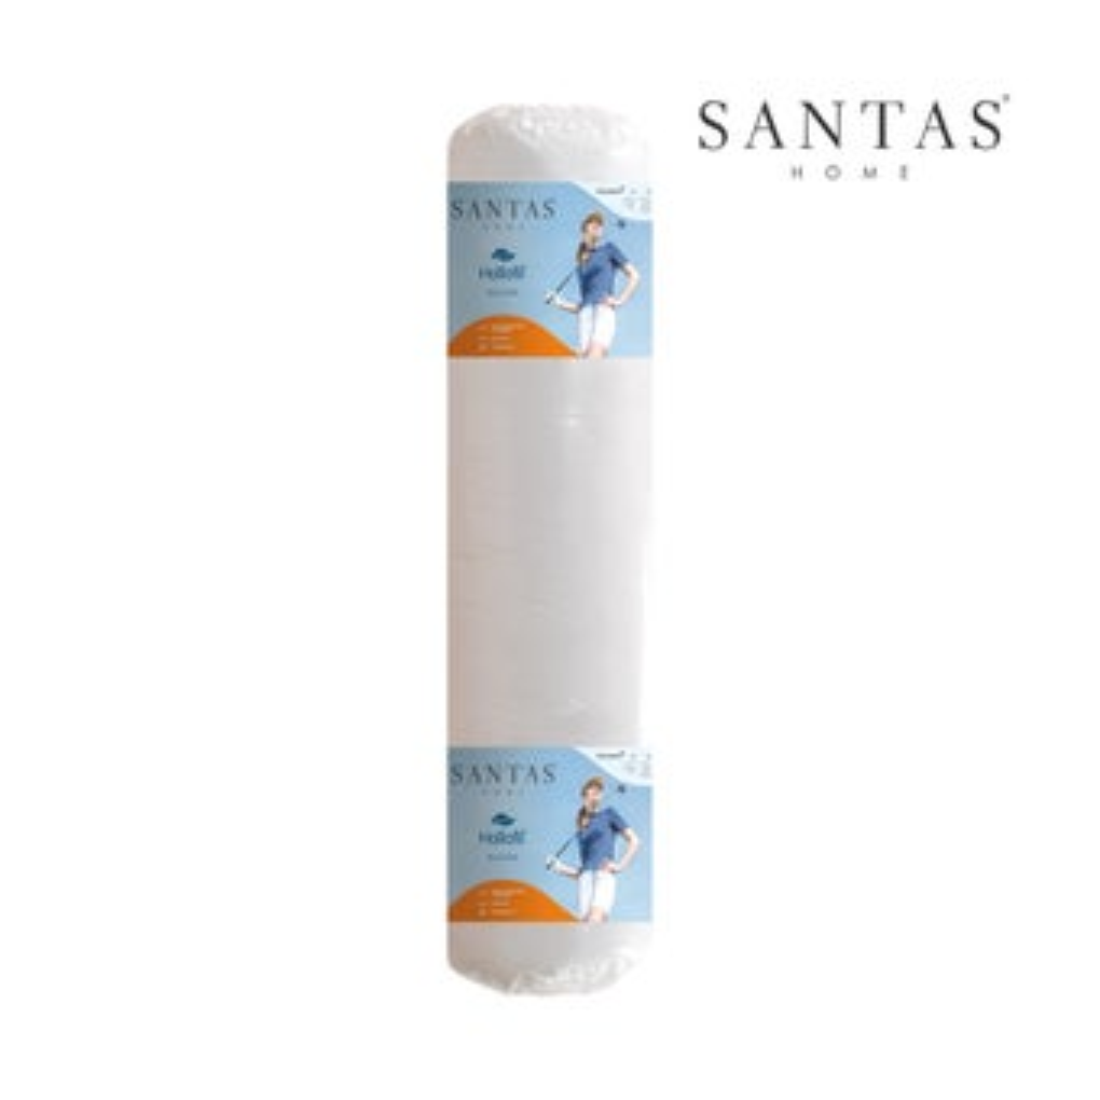 SANTAS หมอนข้าง - รุ่น DACRON® HOLLOFIL®1